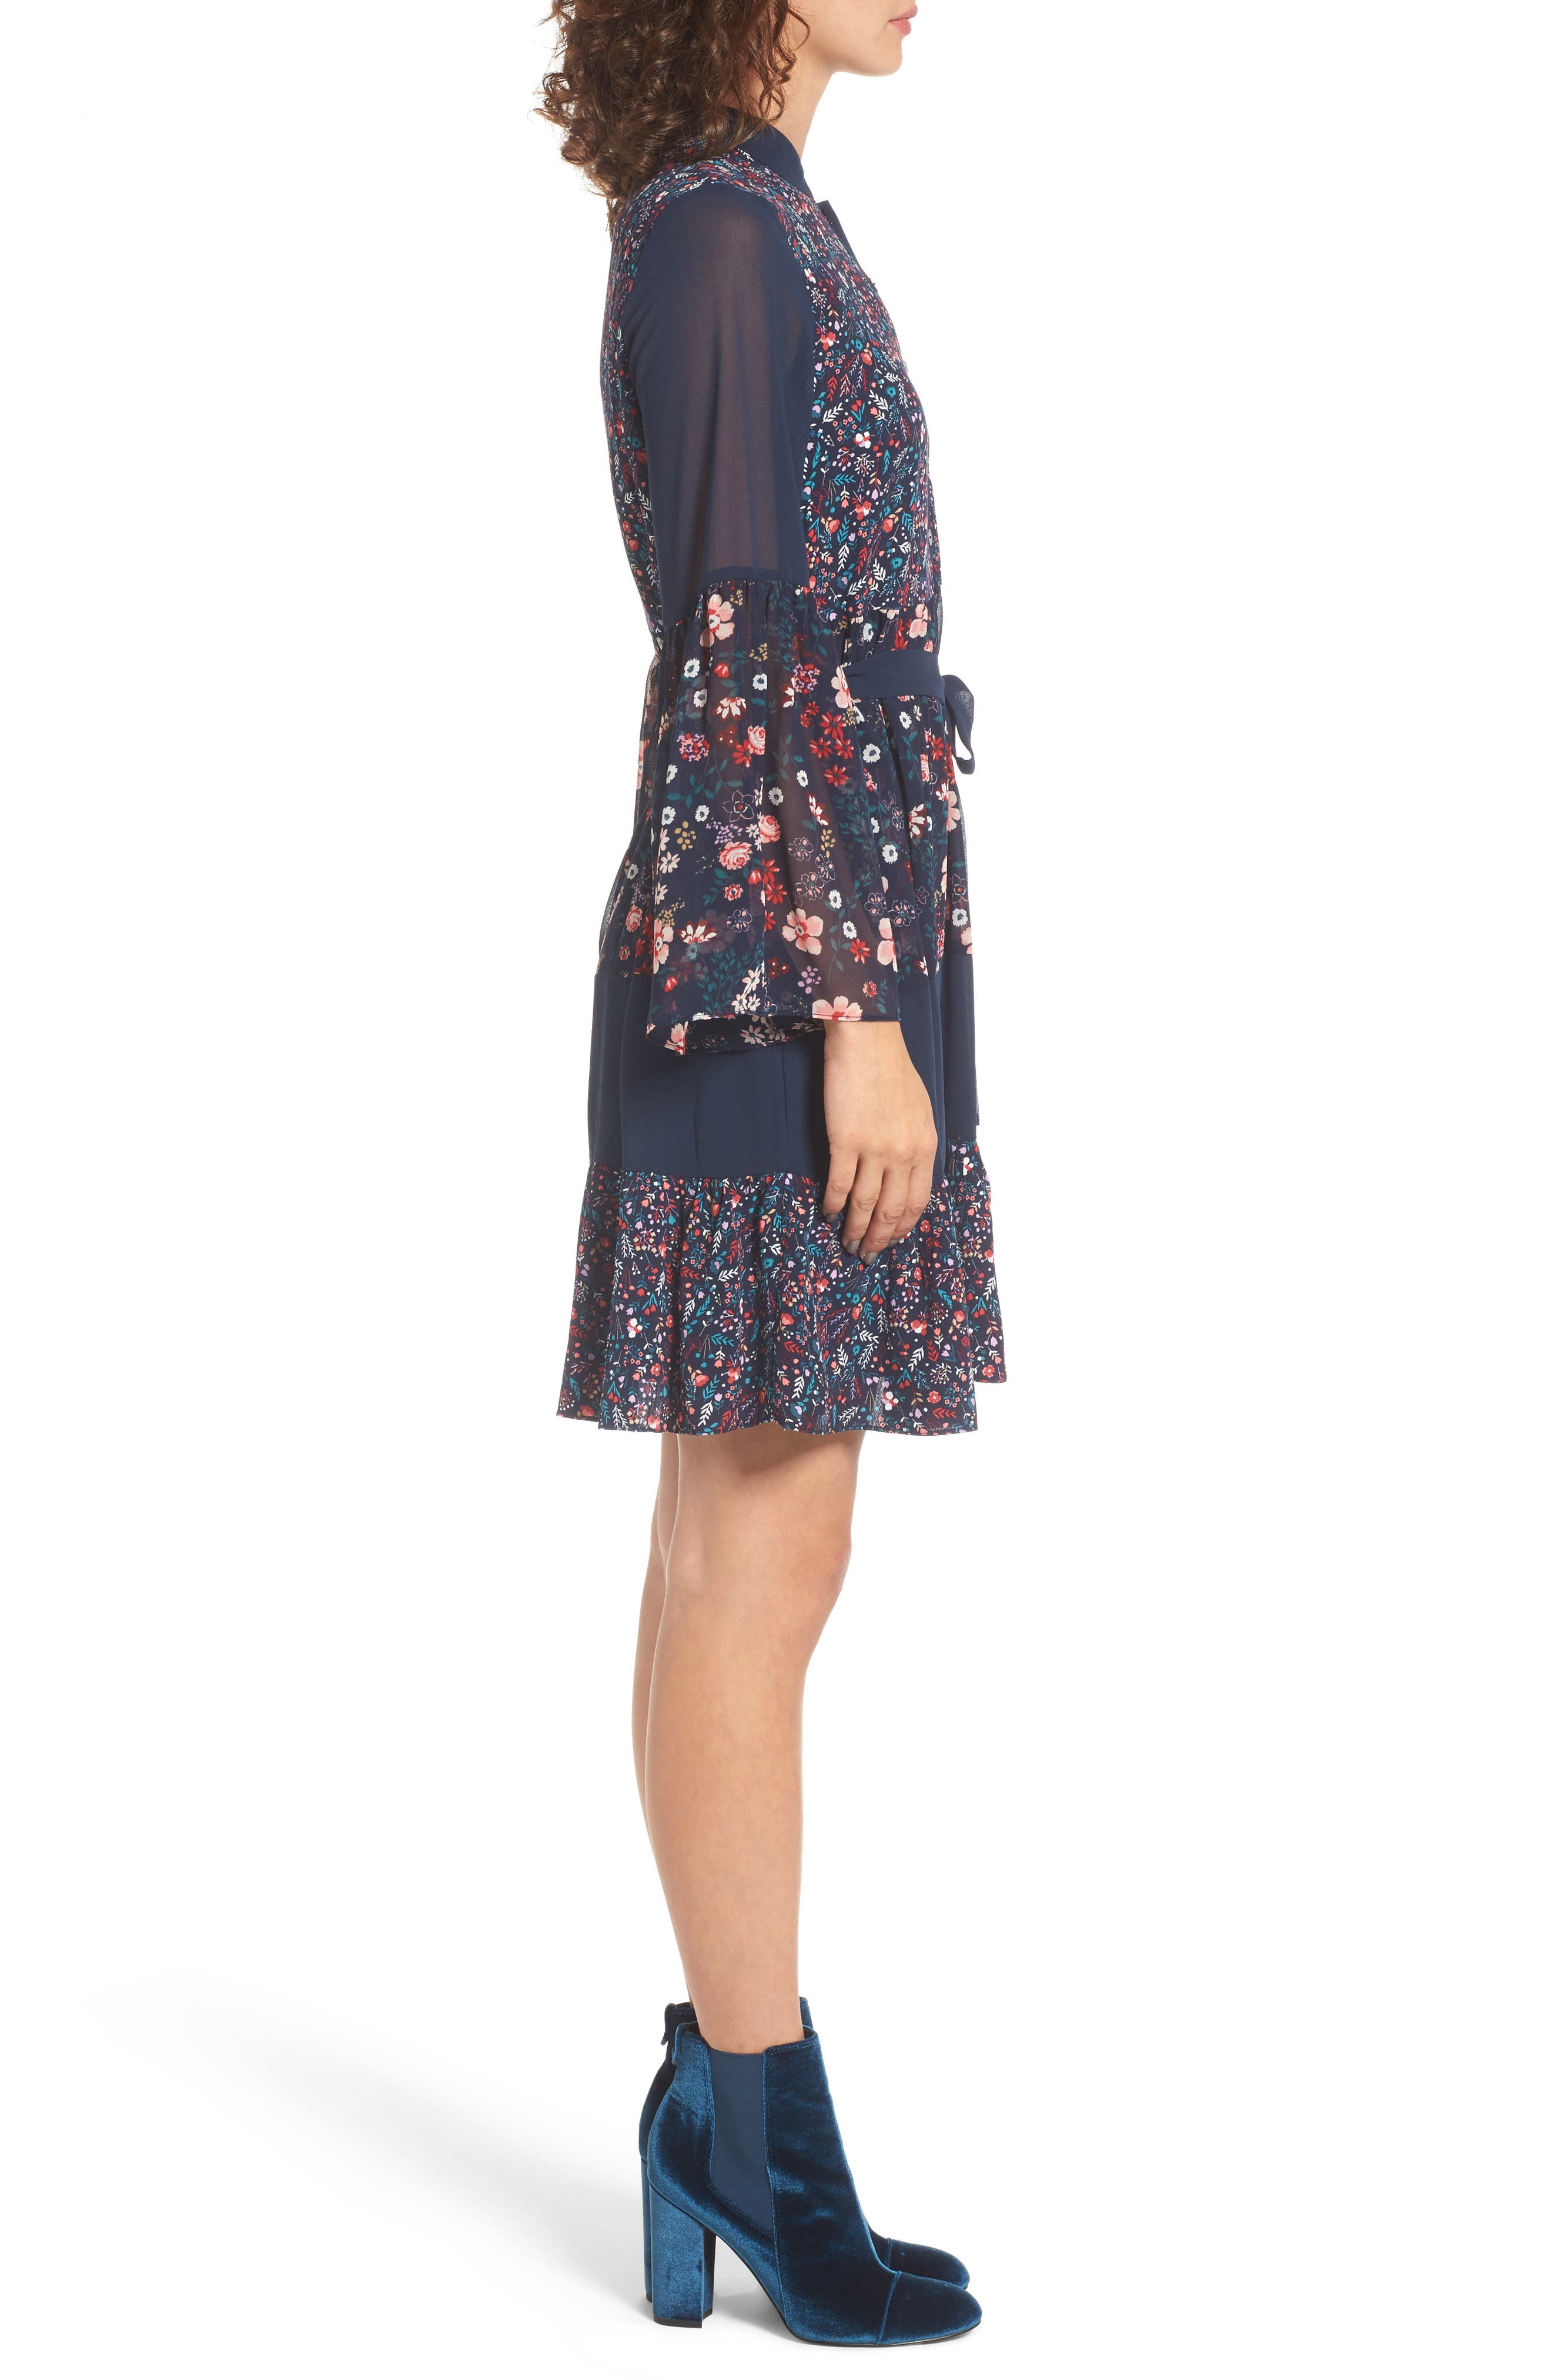 Caprice Floral Mix Shirtdress,                             Alternate thumbnail 3, color,                             Regal Caprice